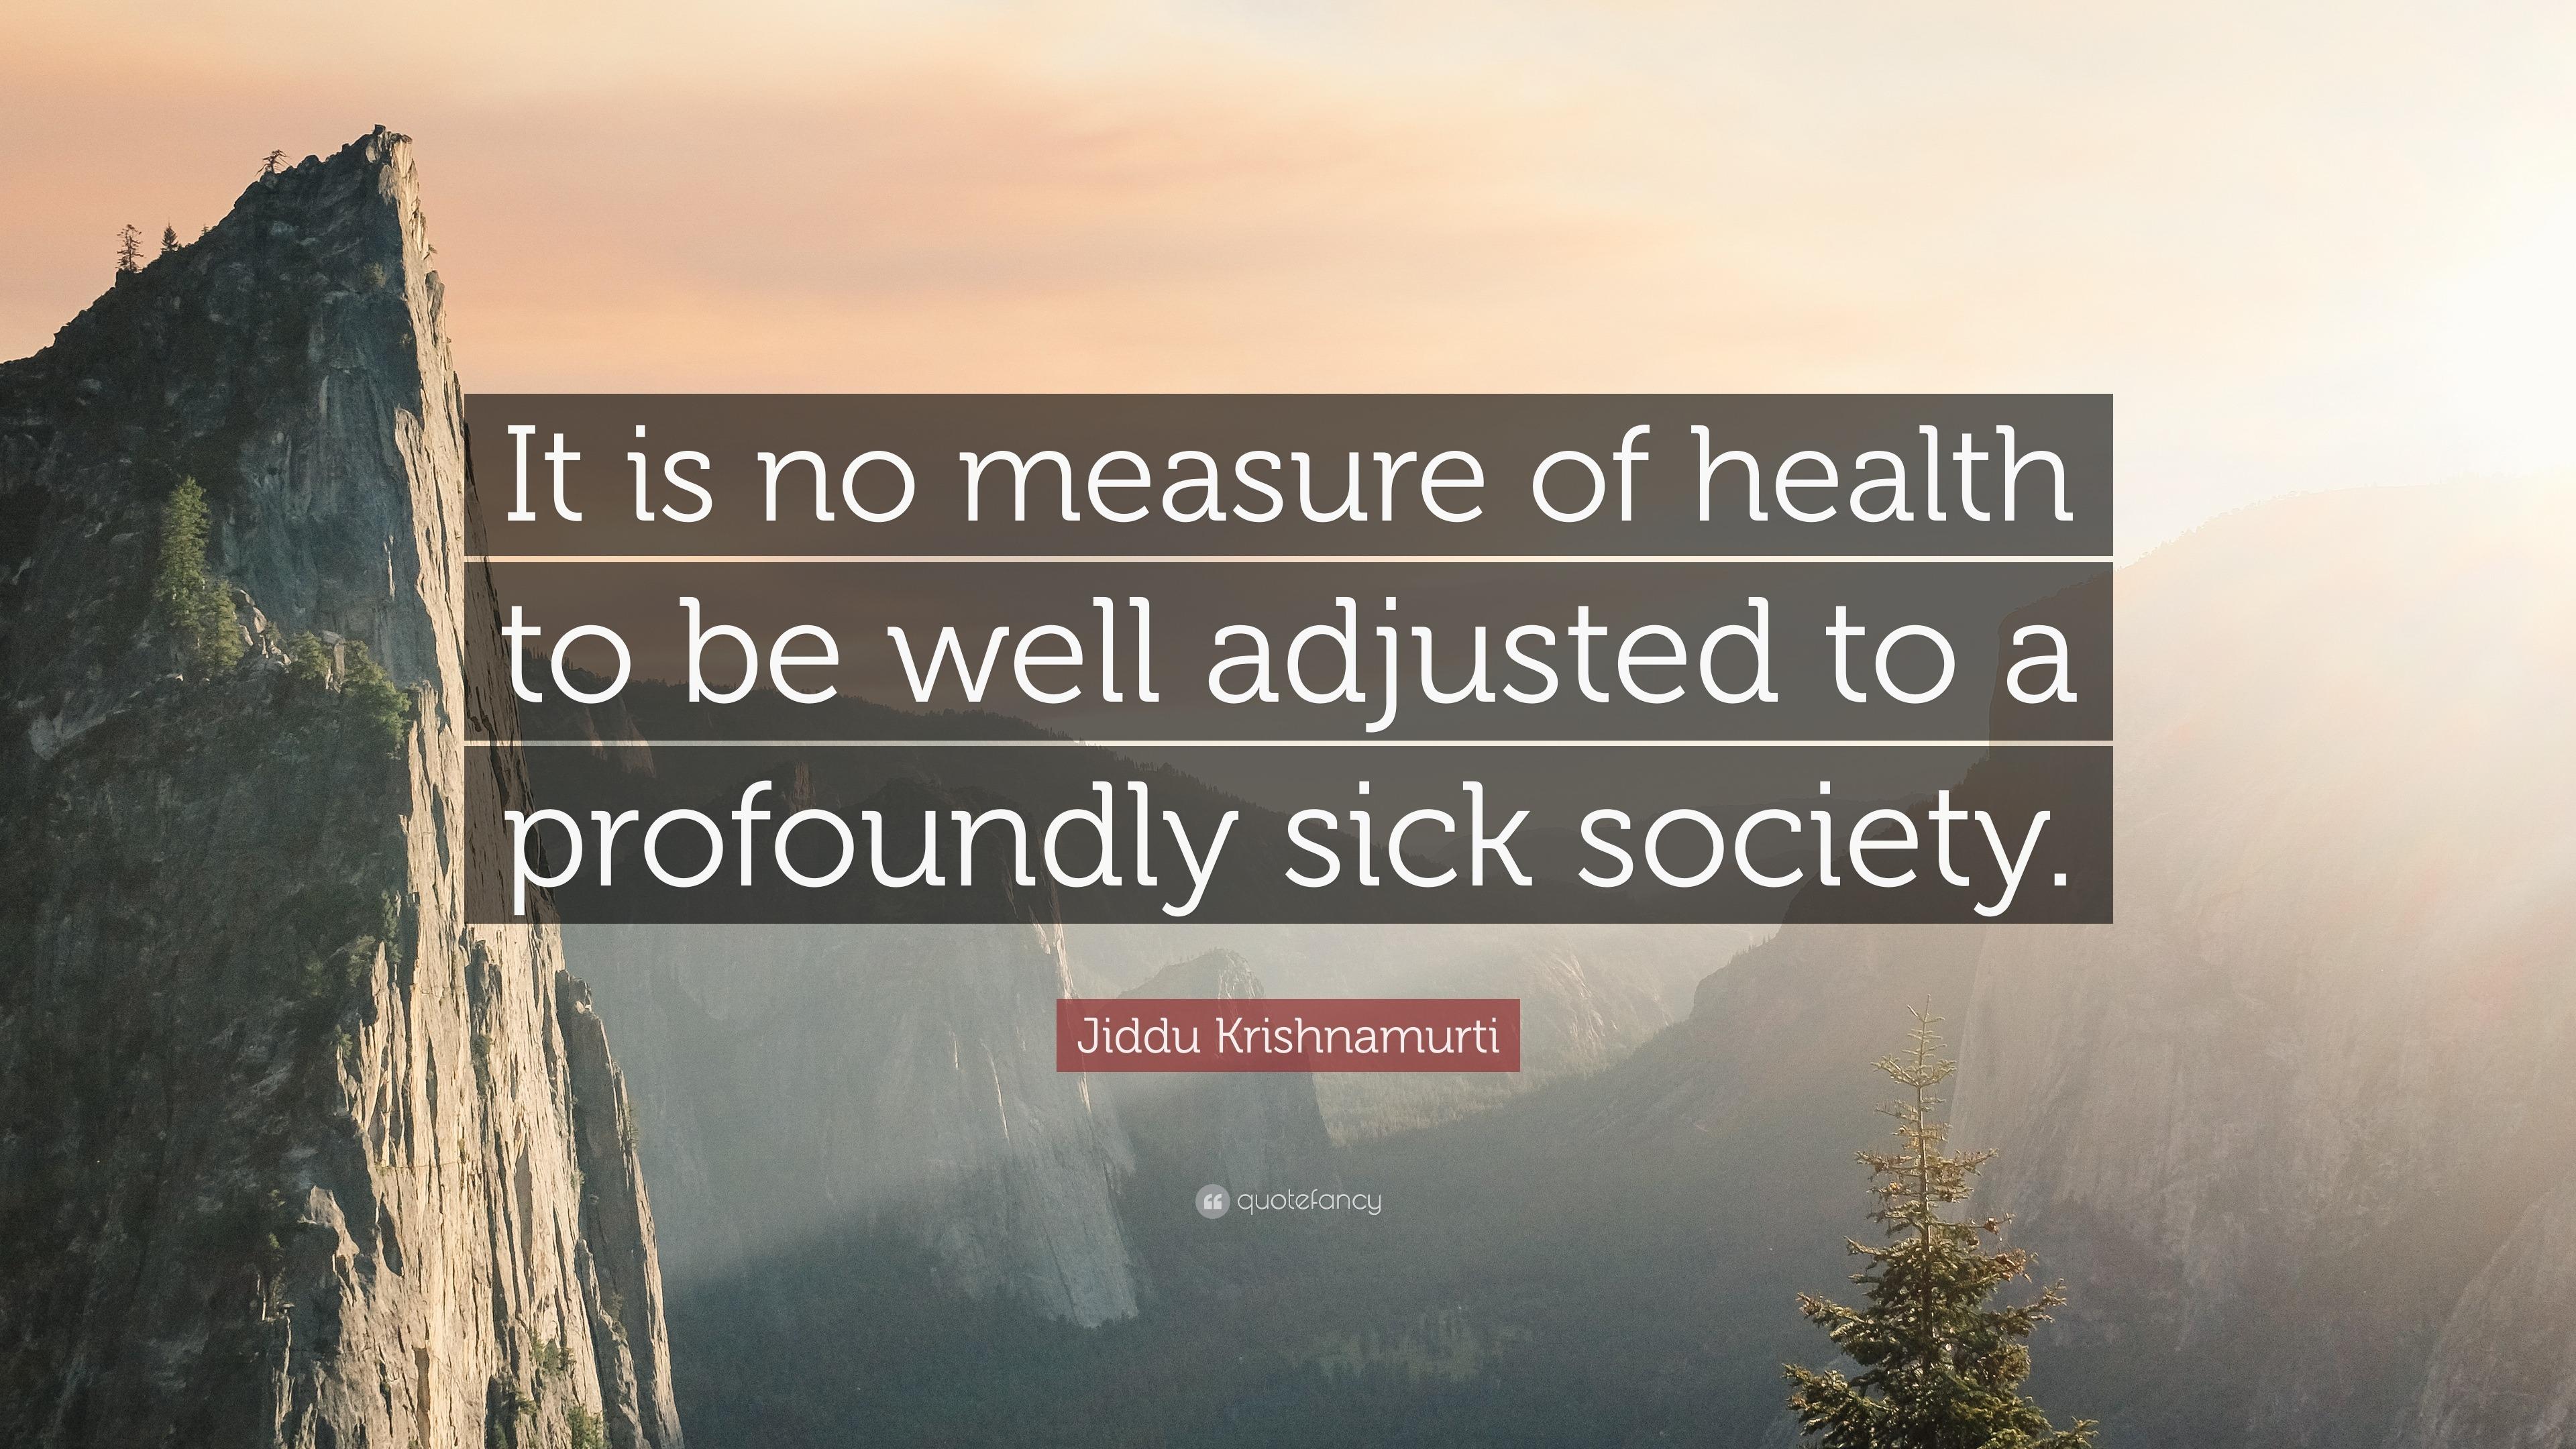 Chanakya Quotes Wallpaper Jiddu Krishnamurti Quote It Is No Measure Of Health To